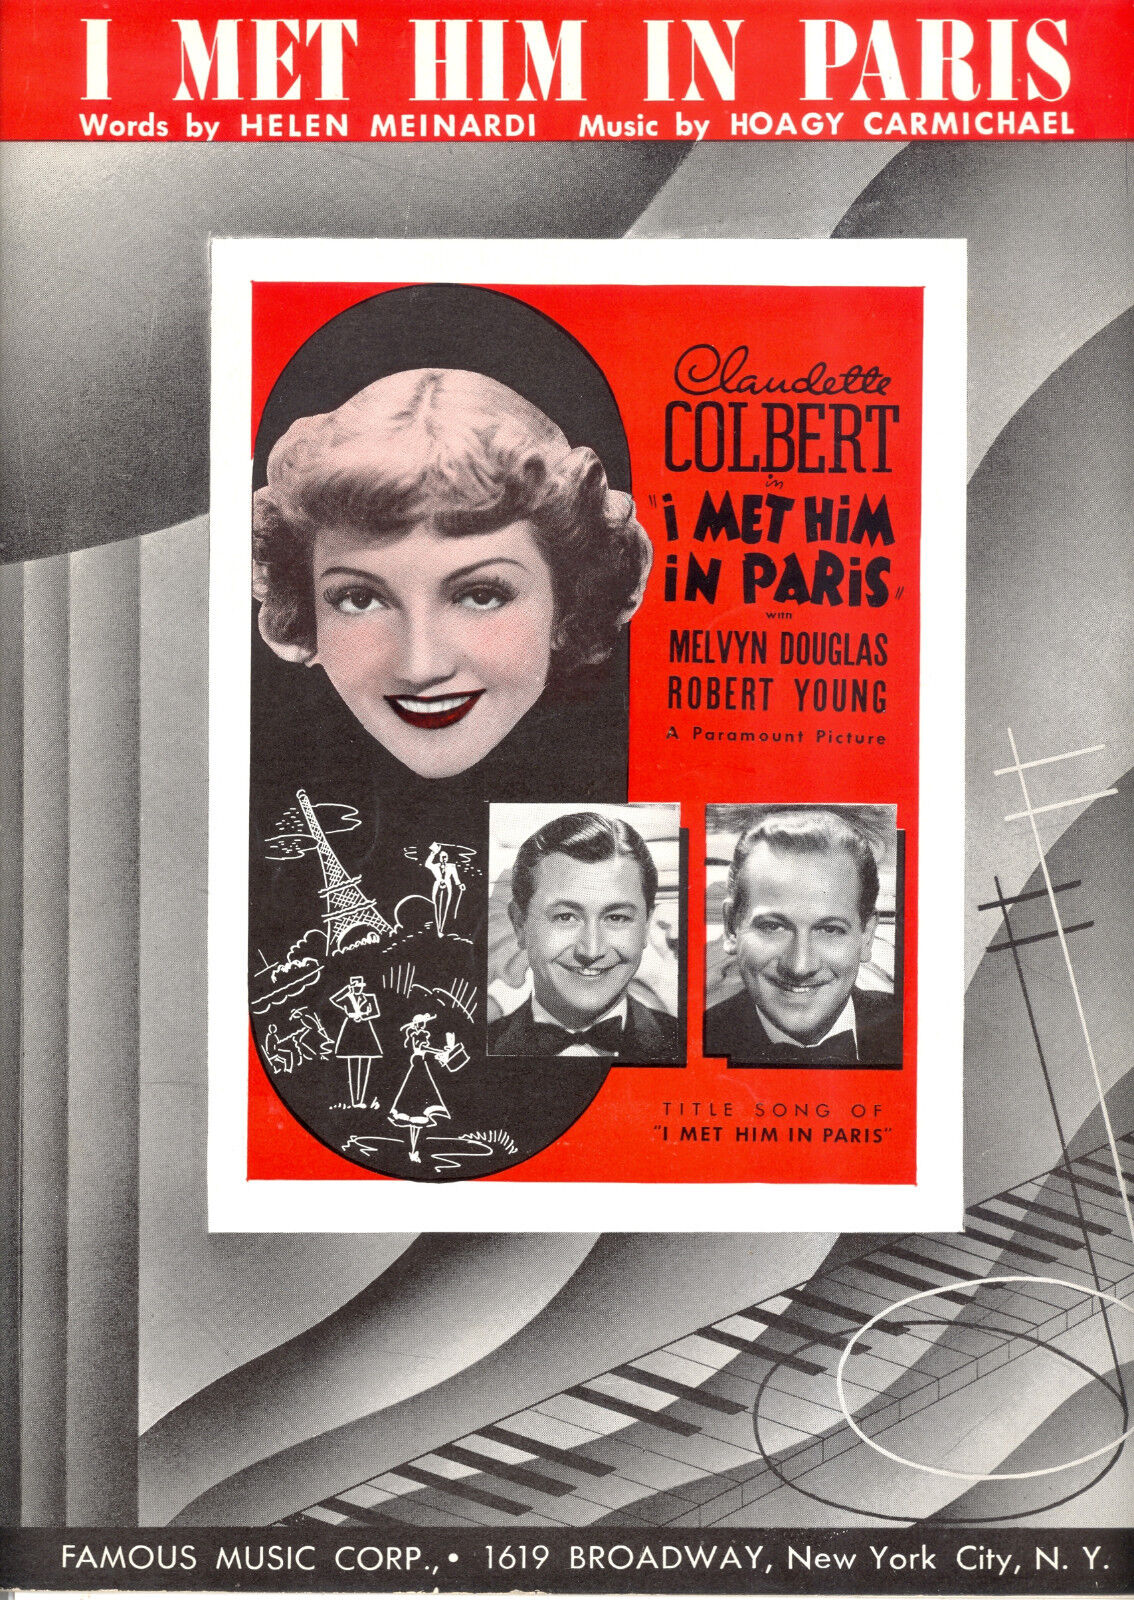 I MET HIM IN PARIS Slab Music Claudette Colbert Melvyn Douglas Robert Young